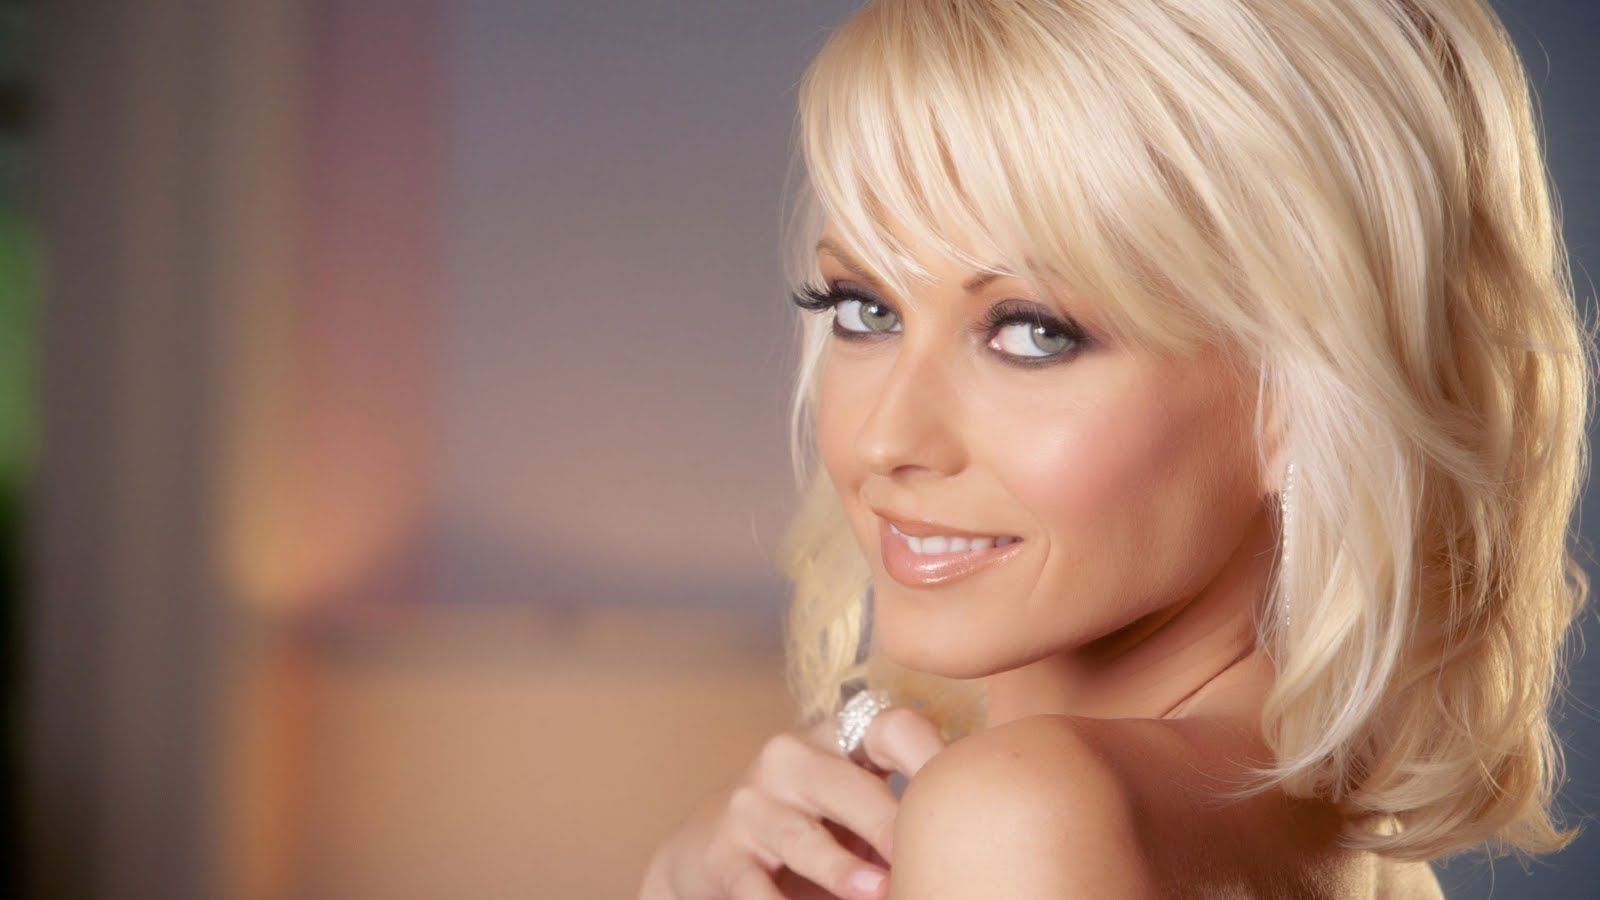 blondinka-lena-foto